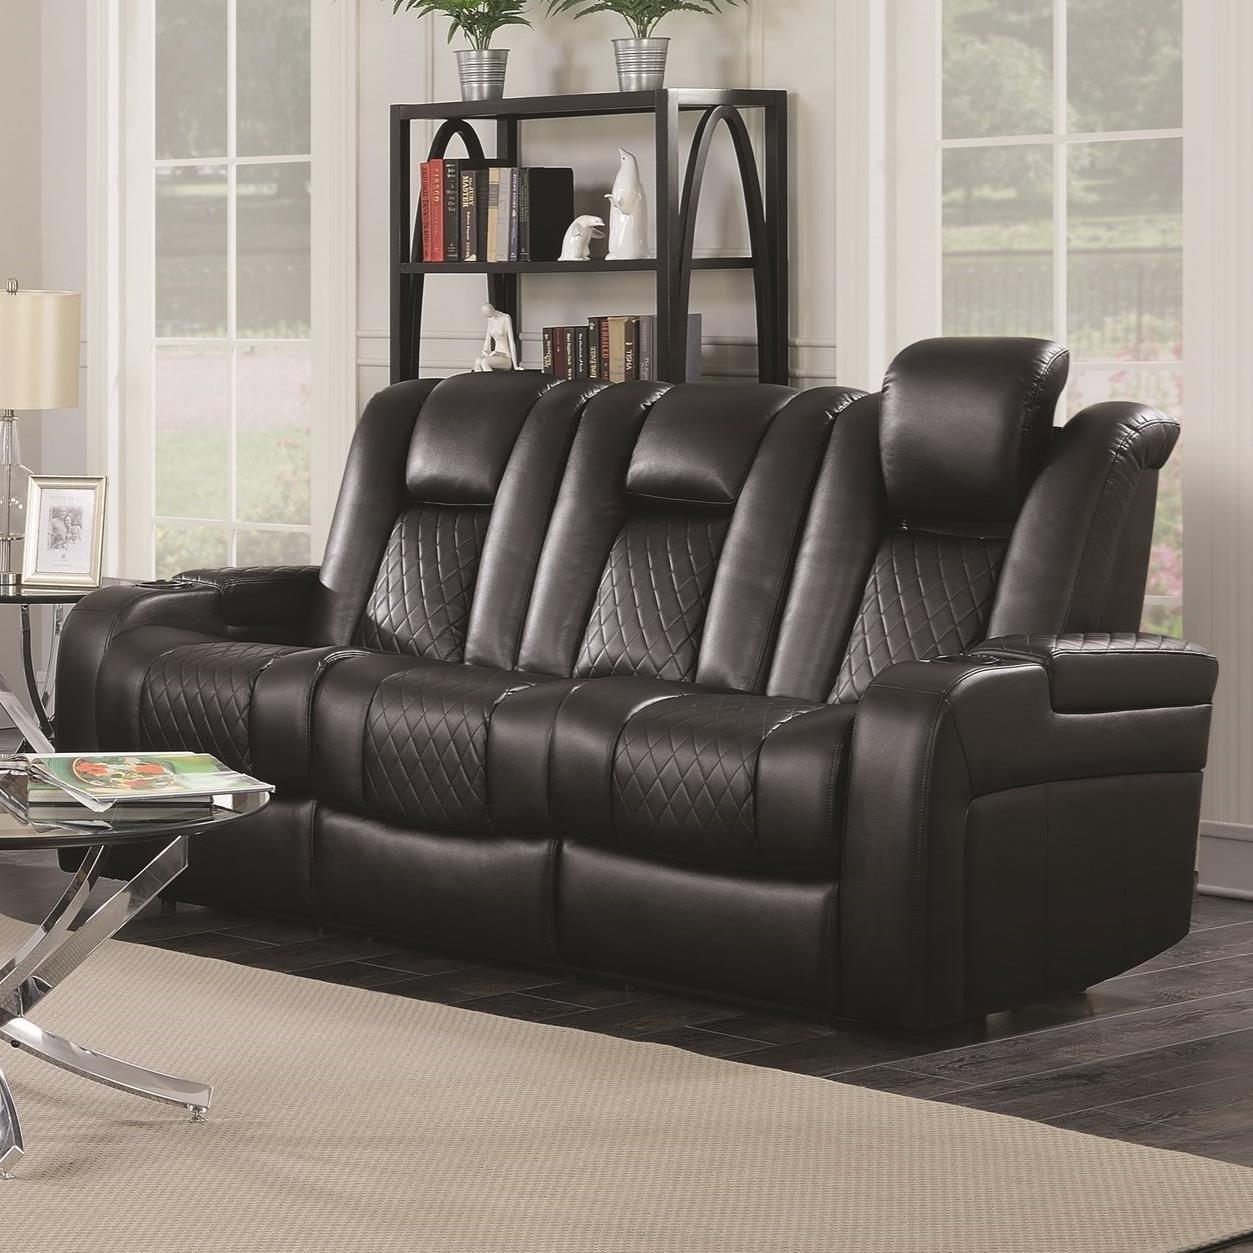 Delangelo Power Reclining Sofa